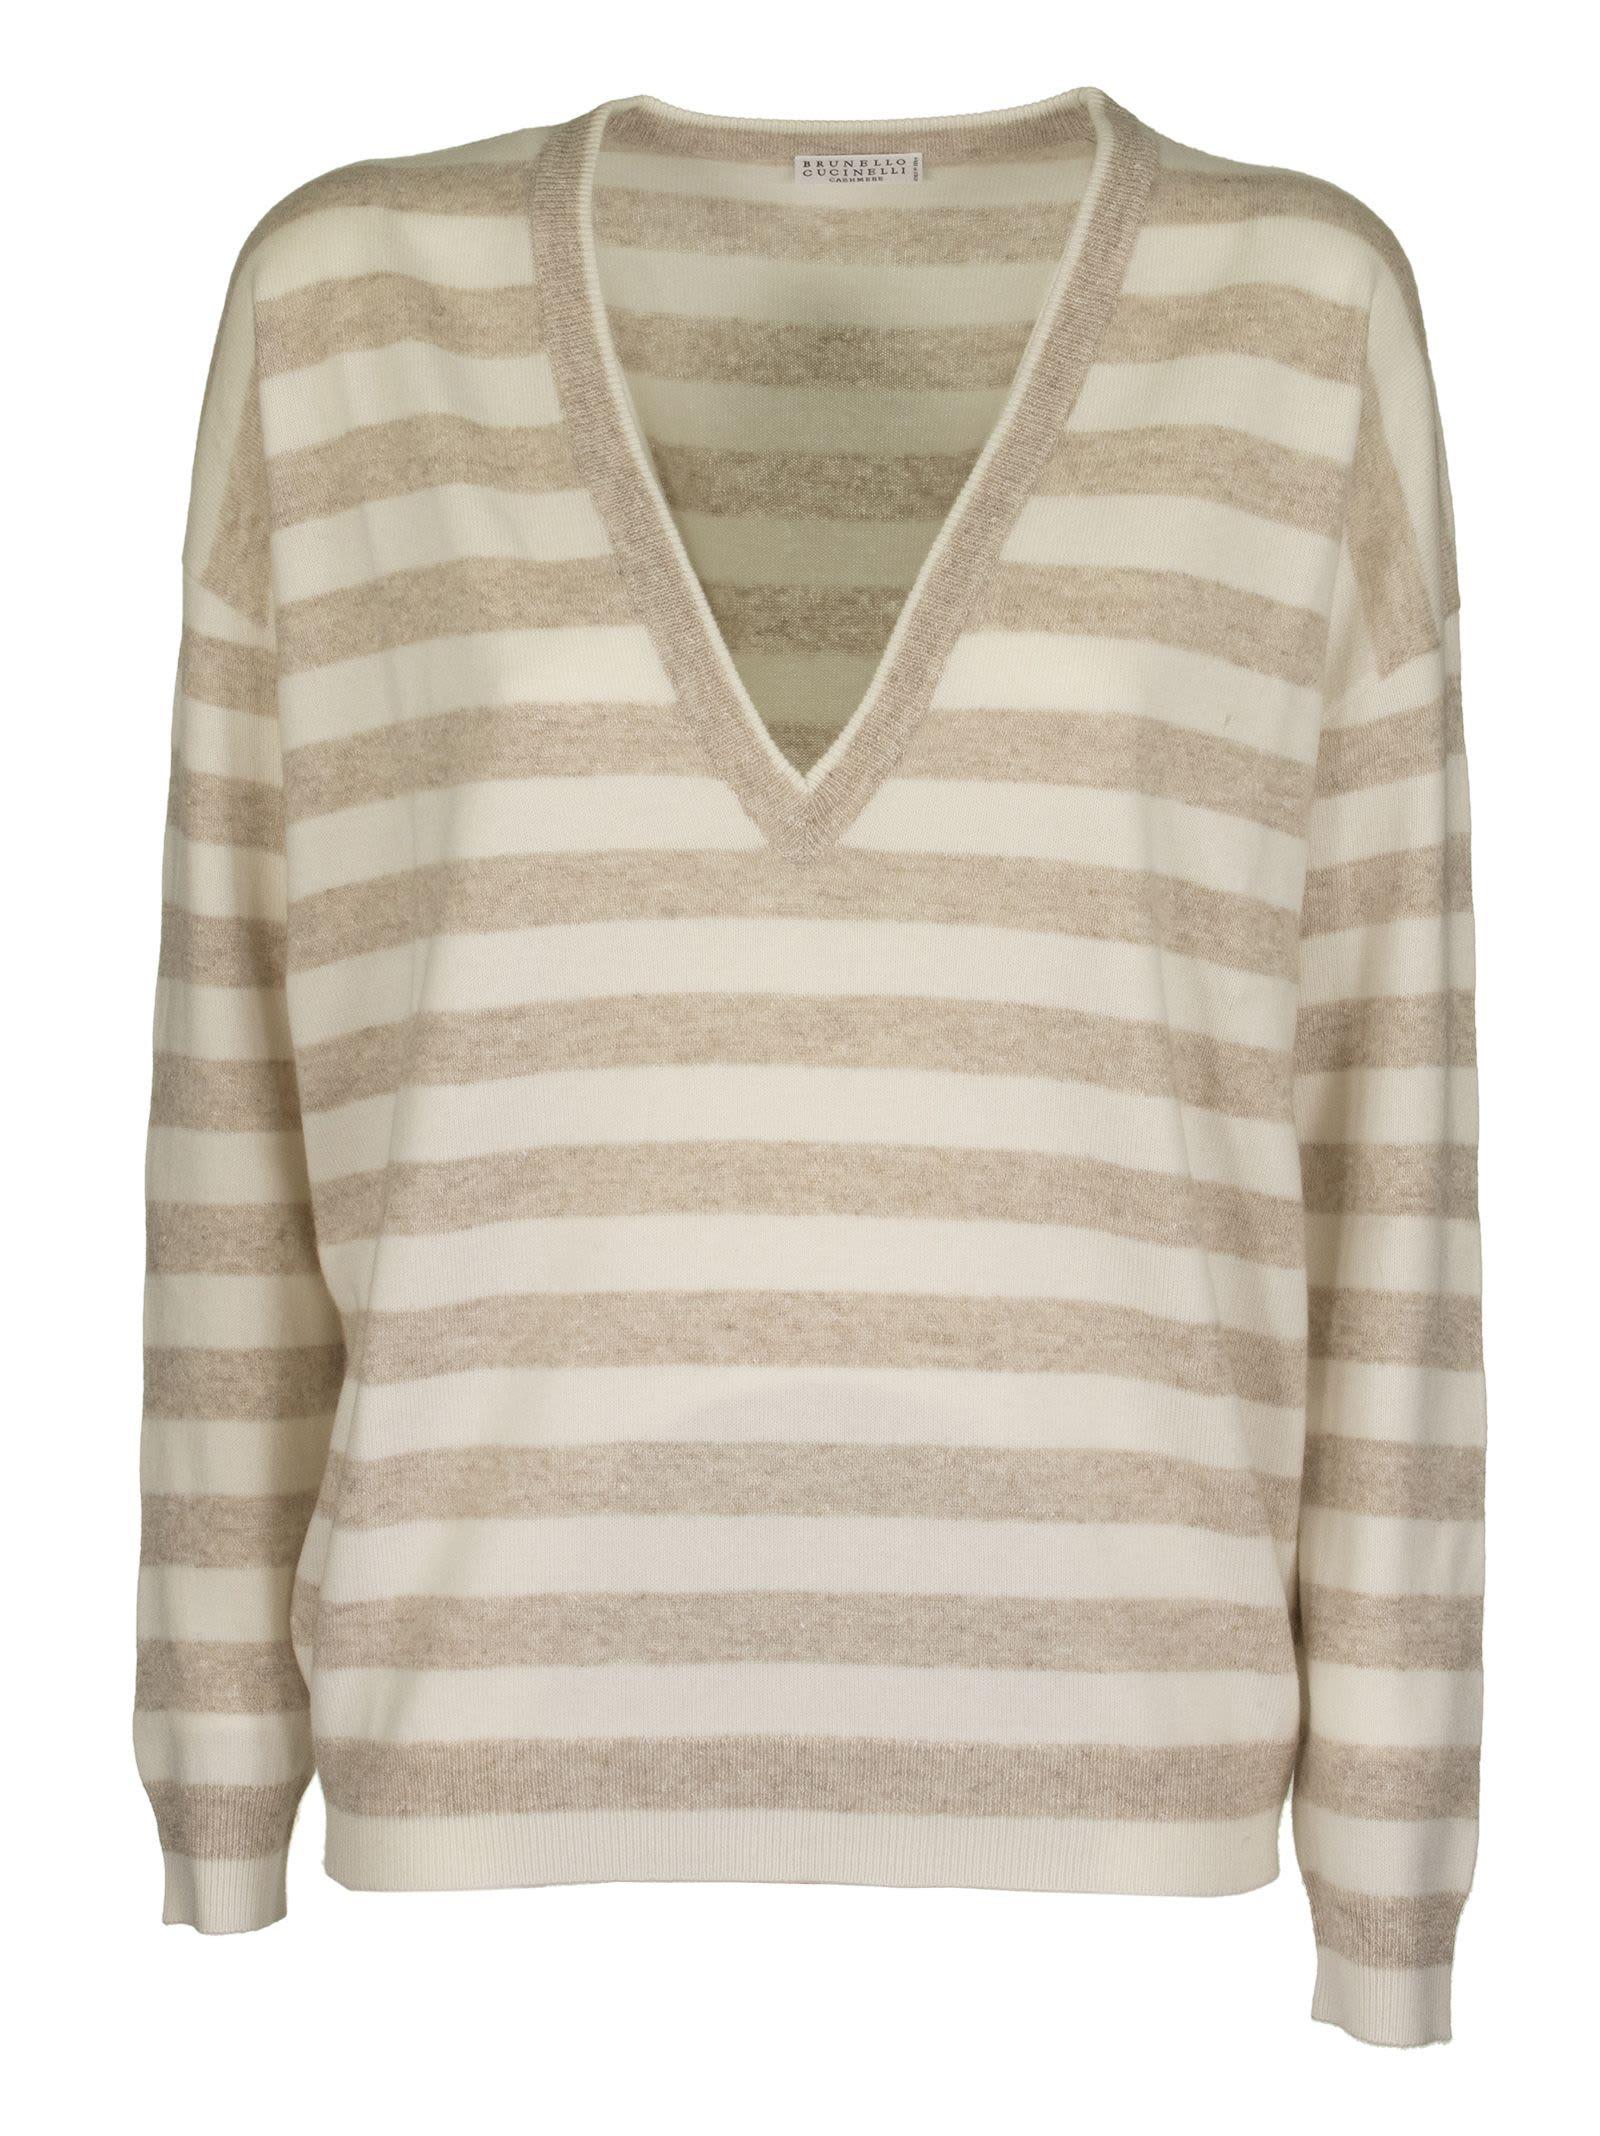 Brunello Cucinelli V-neck Sweater Cashmere And Linen Striped Sweater With Monili